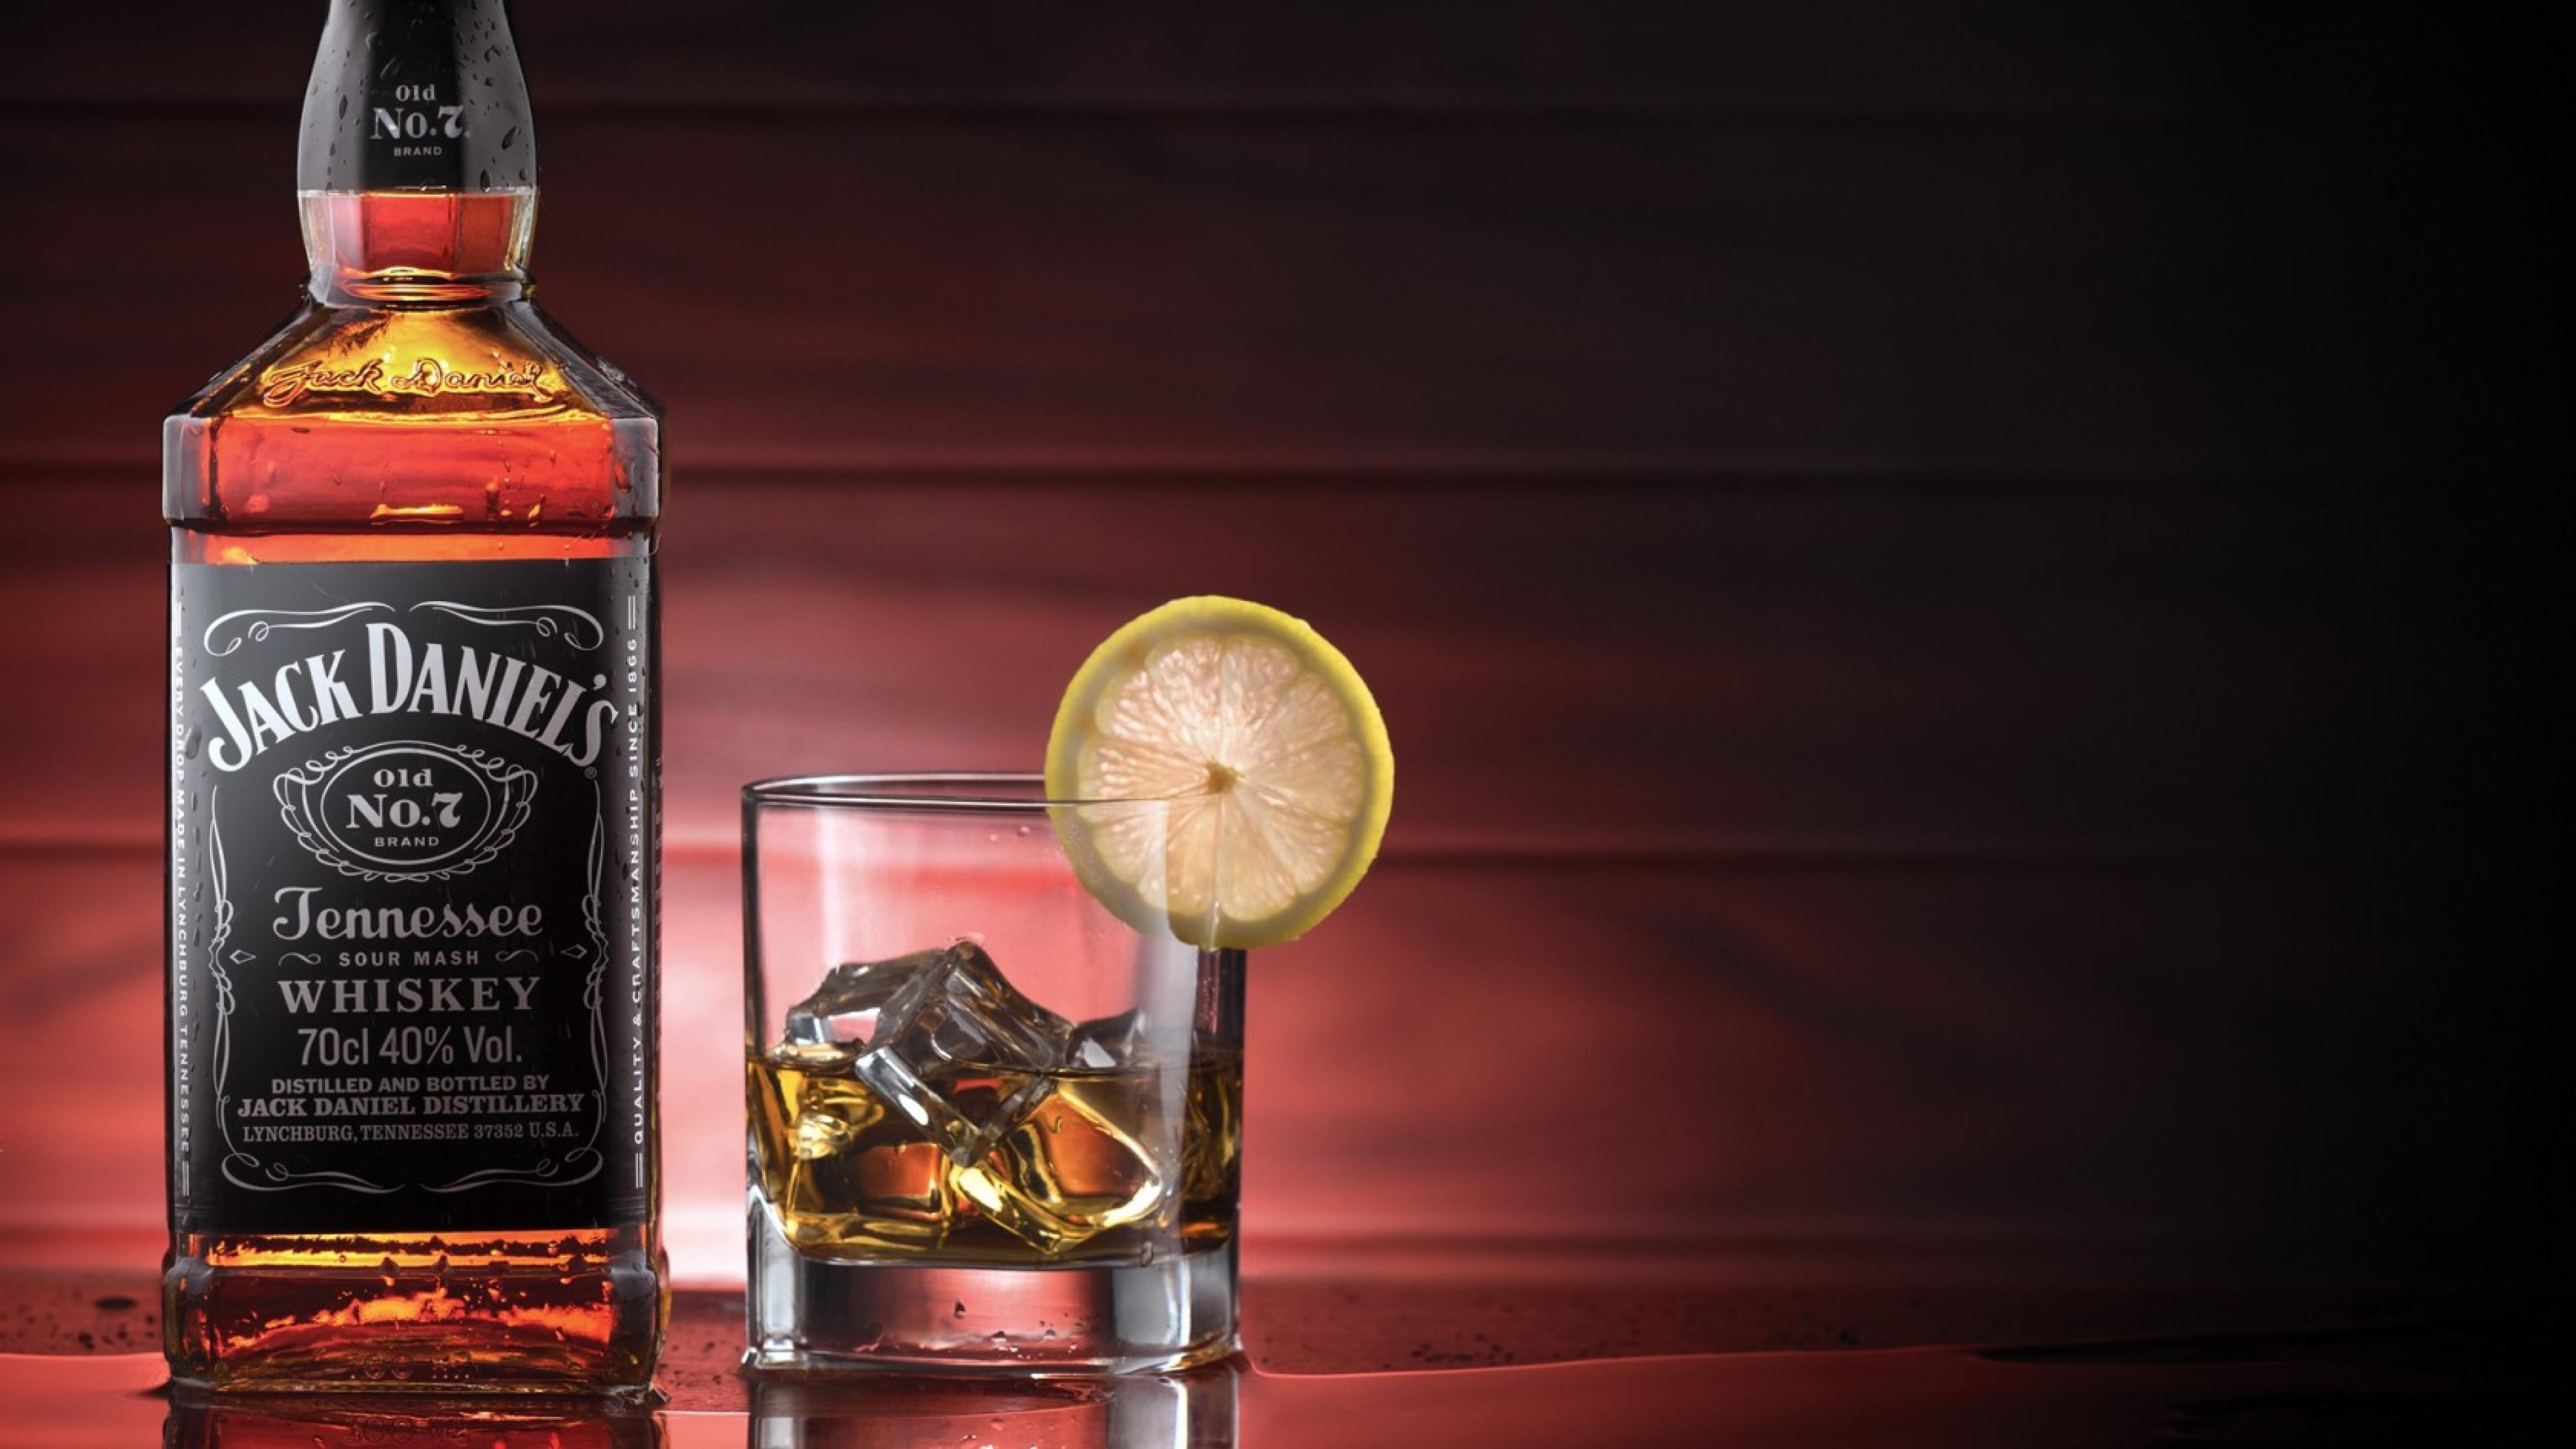 jack daniels 4k 1543946406 - Jack Daniels 4k - whiskey wallpapers, jack daniels wallpapers, bottle wallpapers